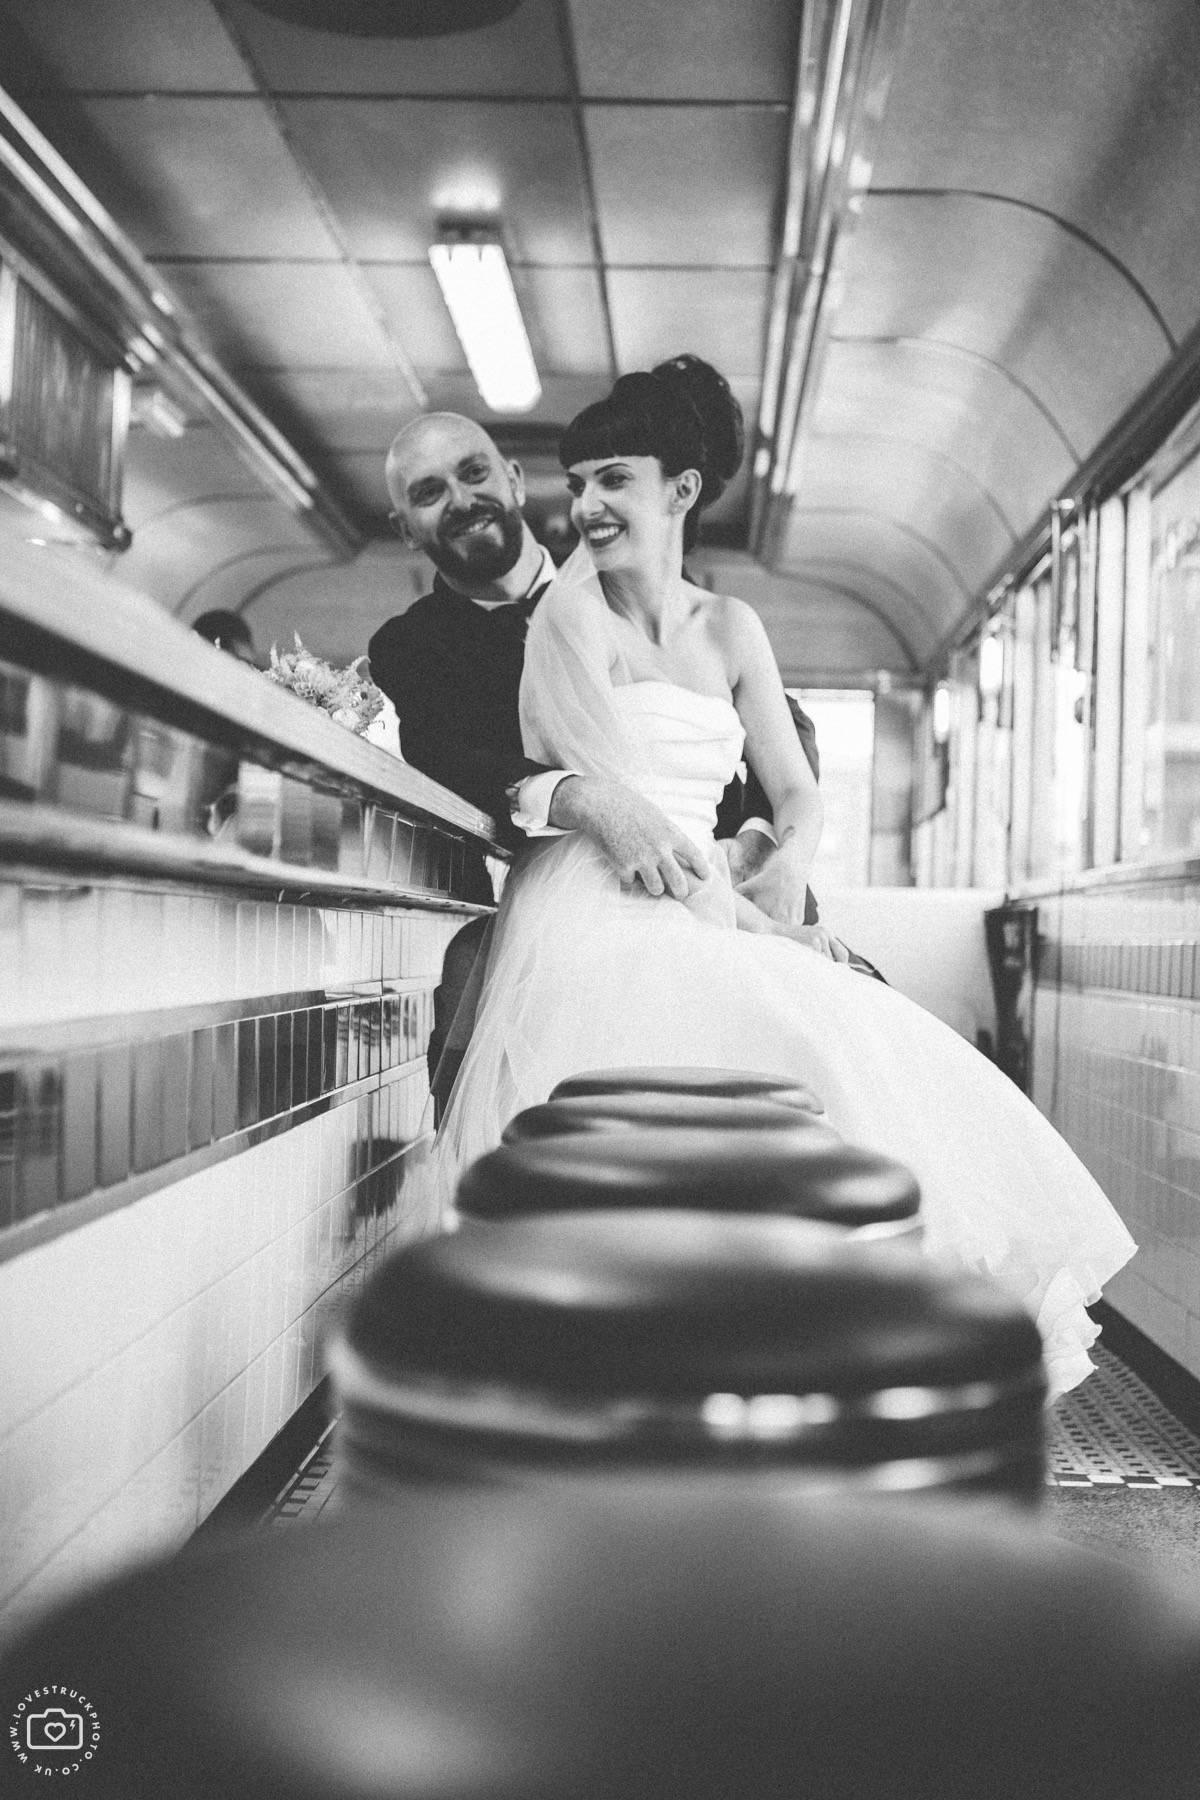 industrial wedding portraits, boho couple wedding portraits, scottish groom wedding photos, london wedding couple shots, trinity buoy wharf wedding portraits, fatboys diner wedding